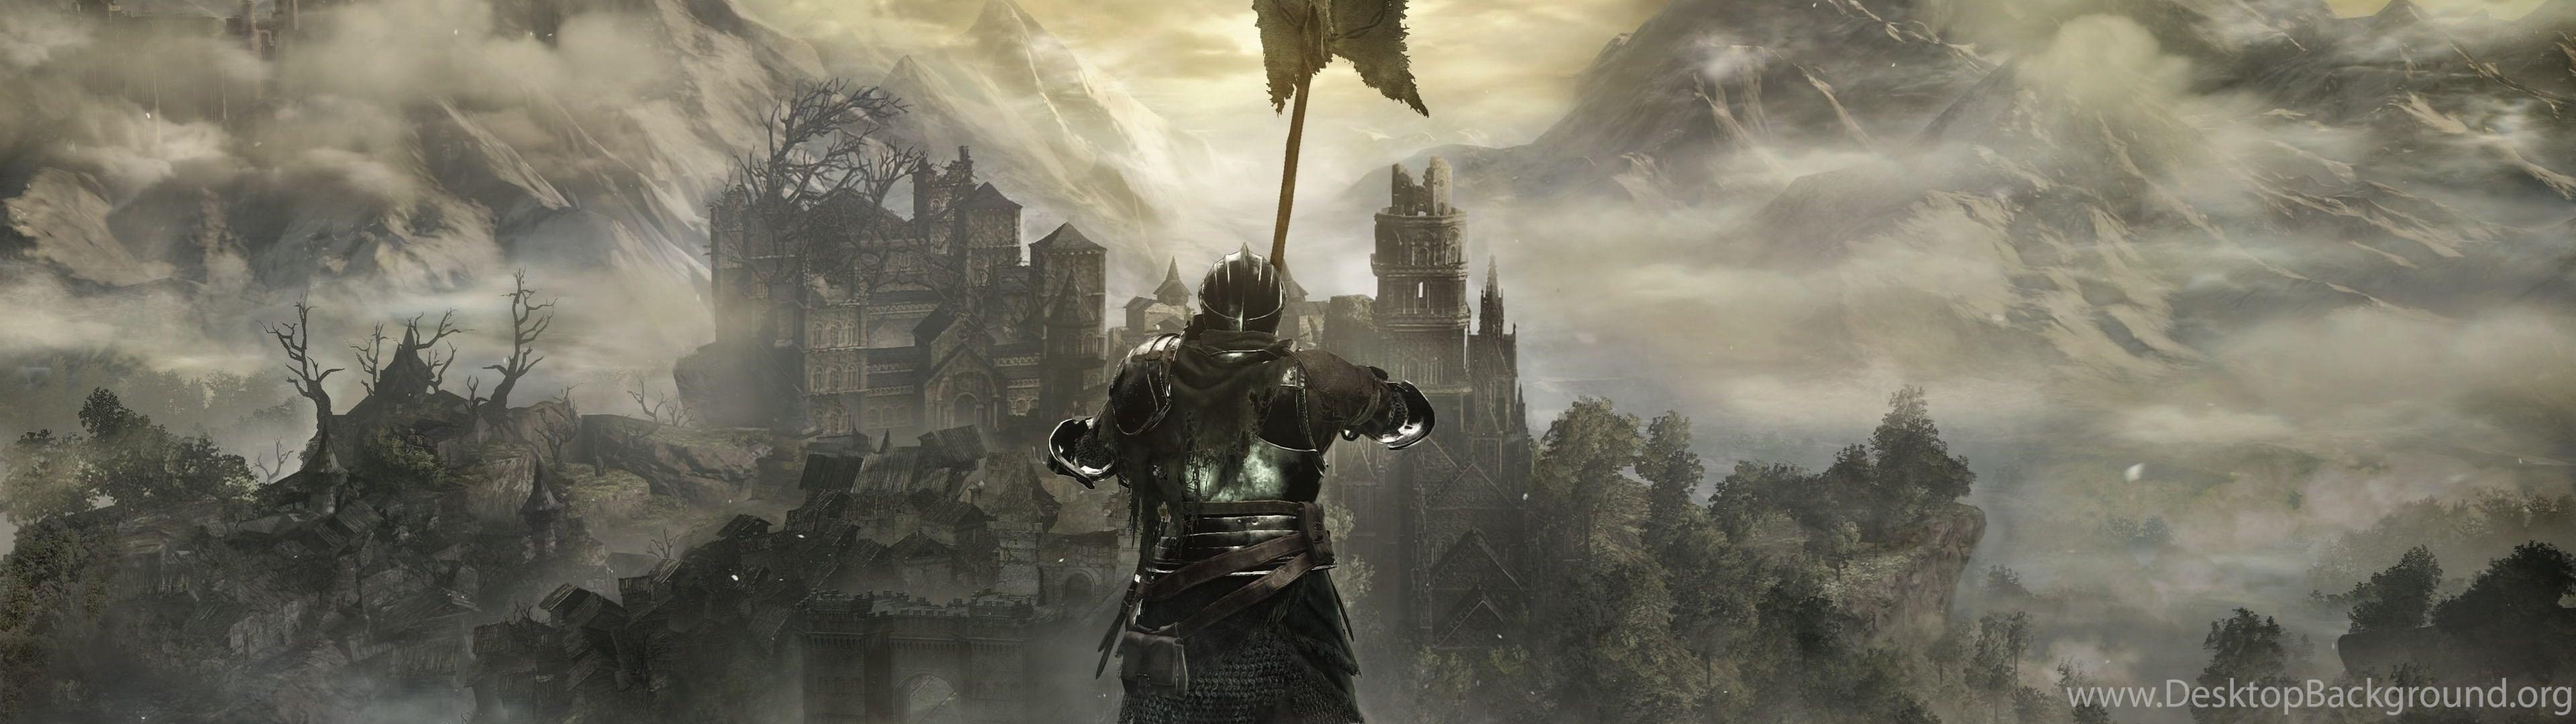 Dark Souls Pc Game Wallpapers Free Download High Quality Desktop